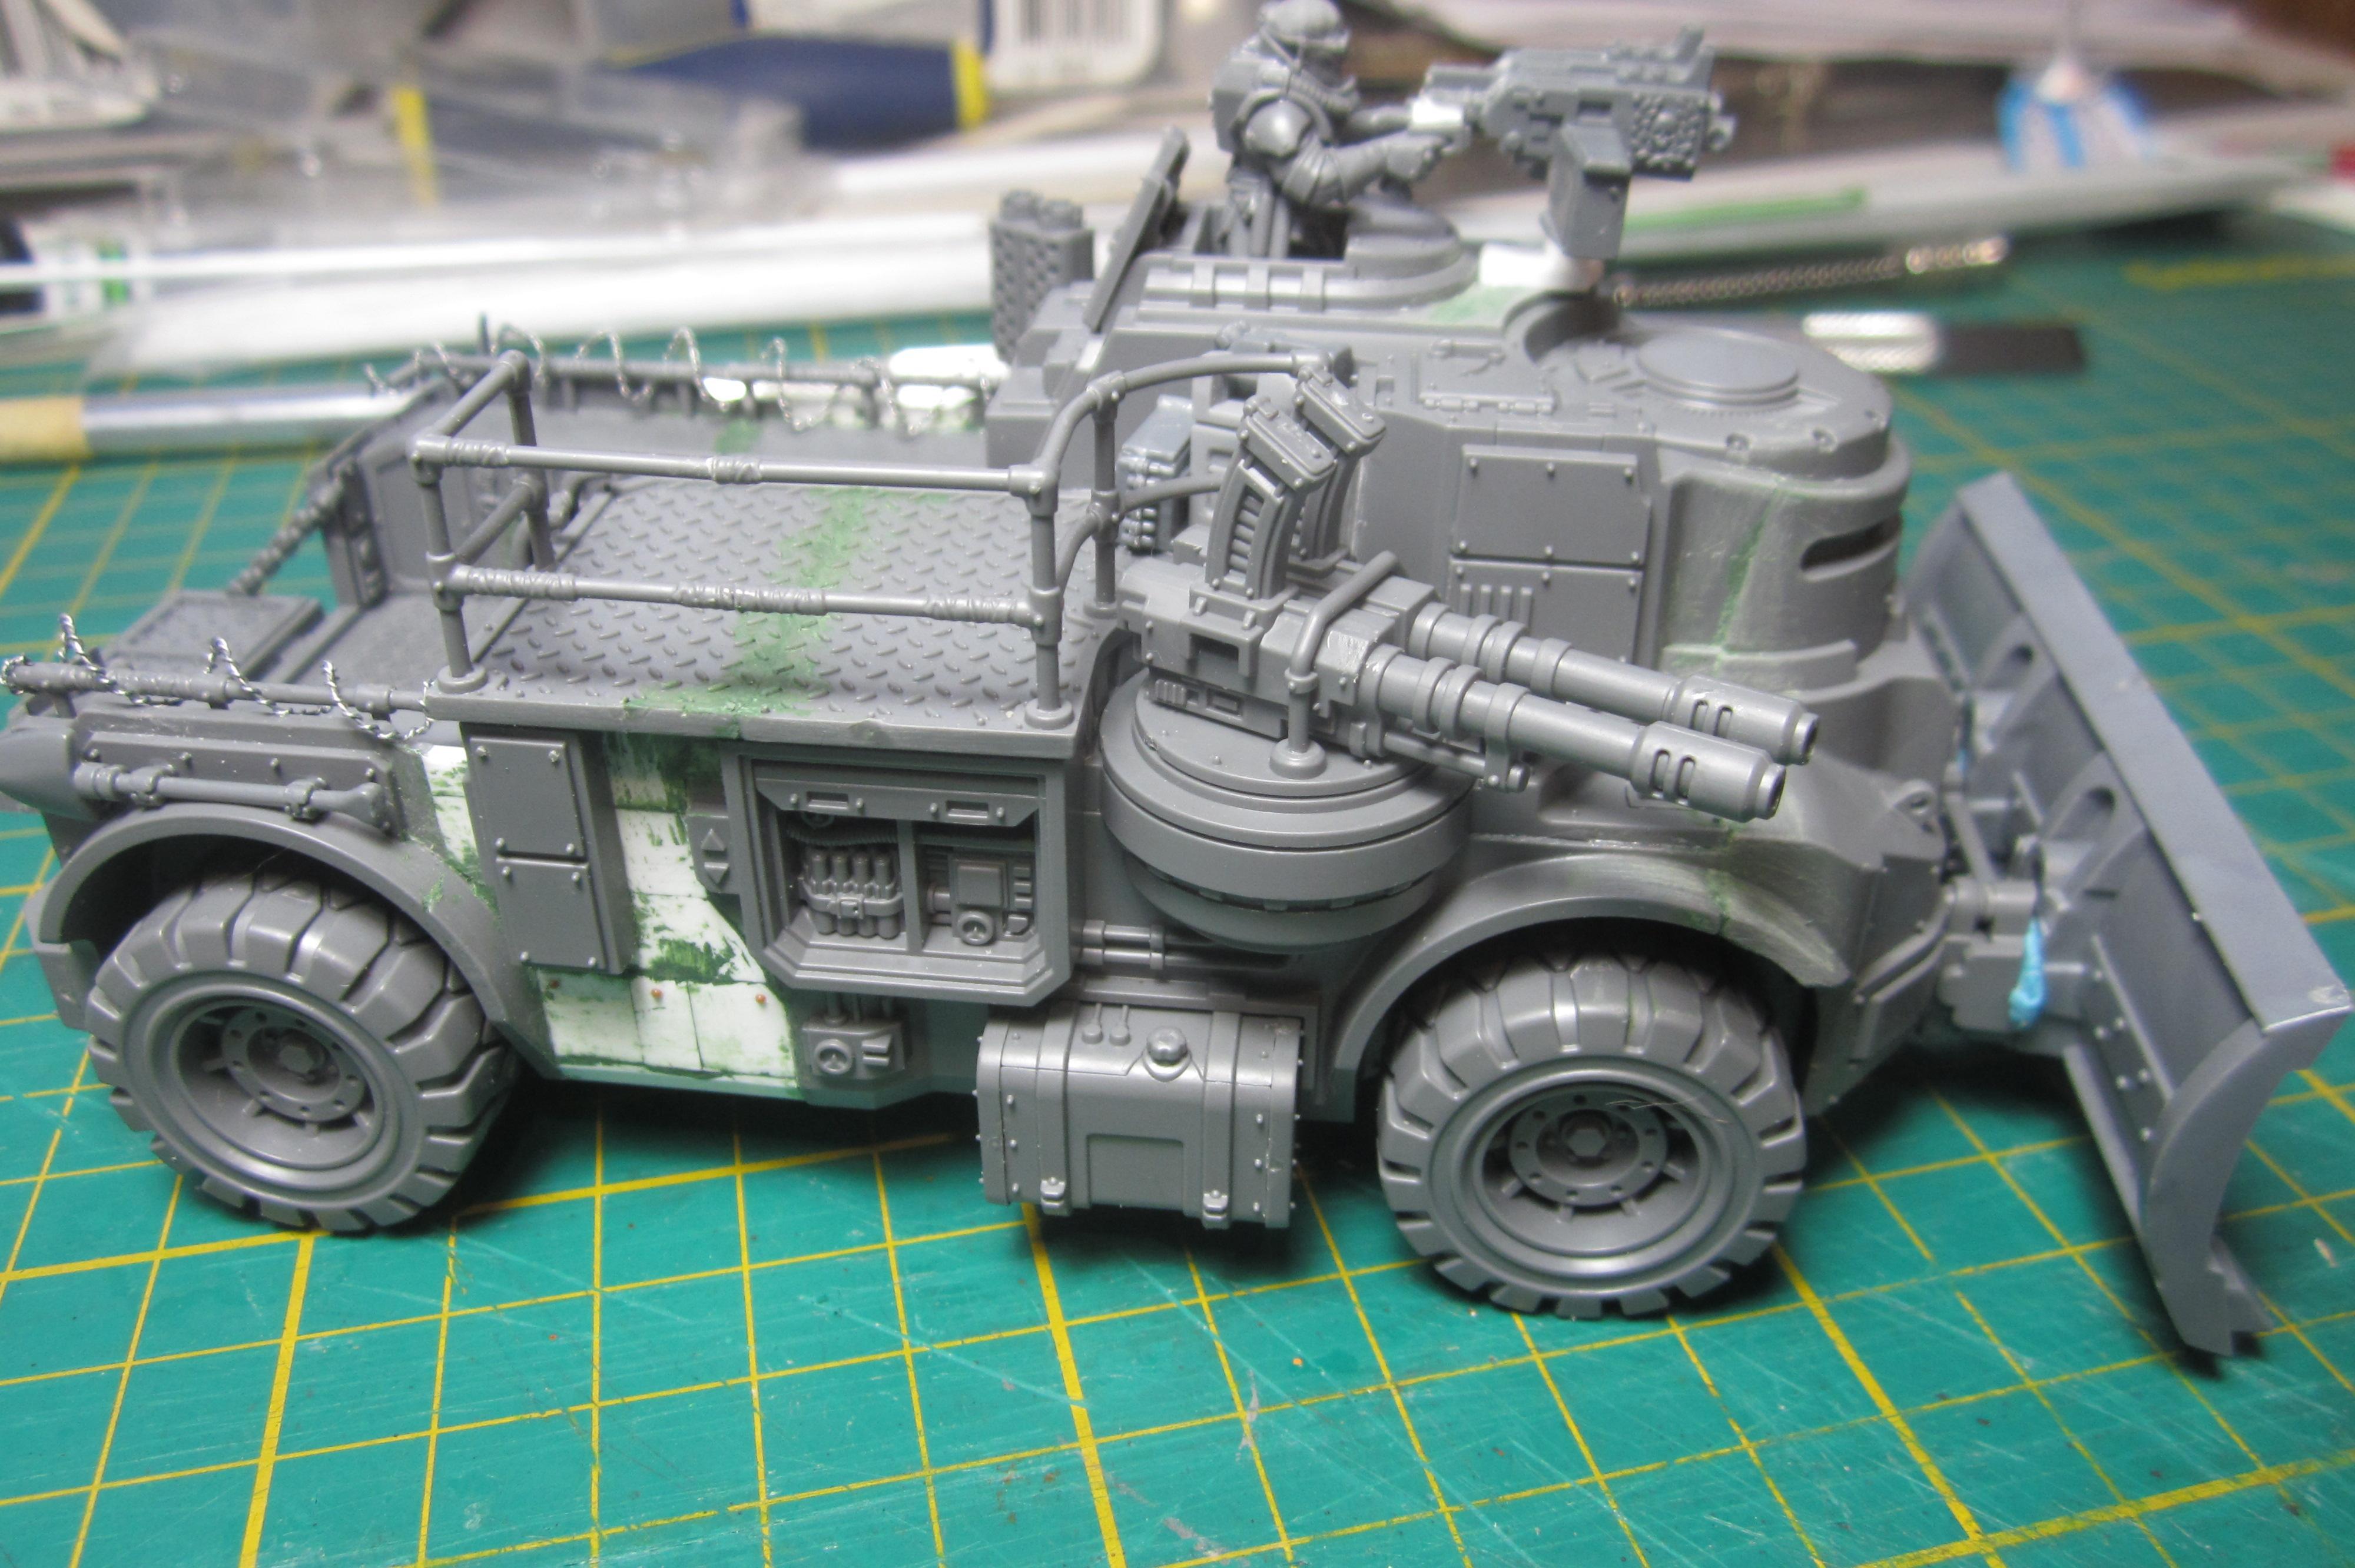 Civilian, Conversion, Genestealer Cult, Goliath Truck, Gorkamorka, Imperial Guard, Necromunda, Warhammer 40,000